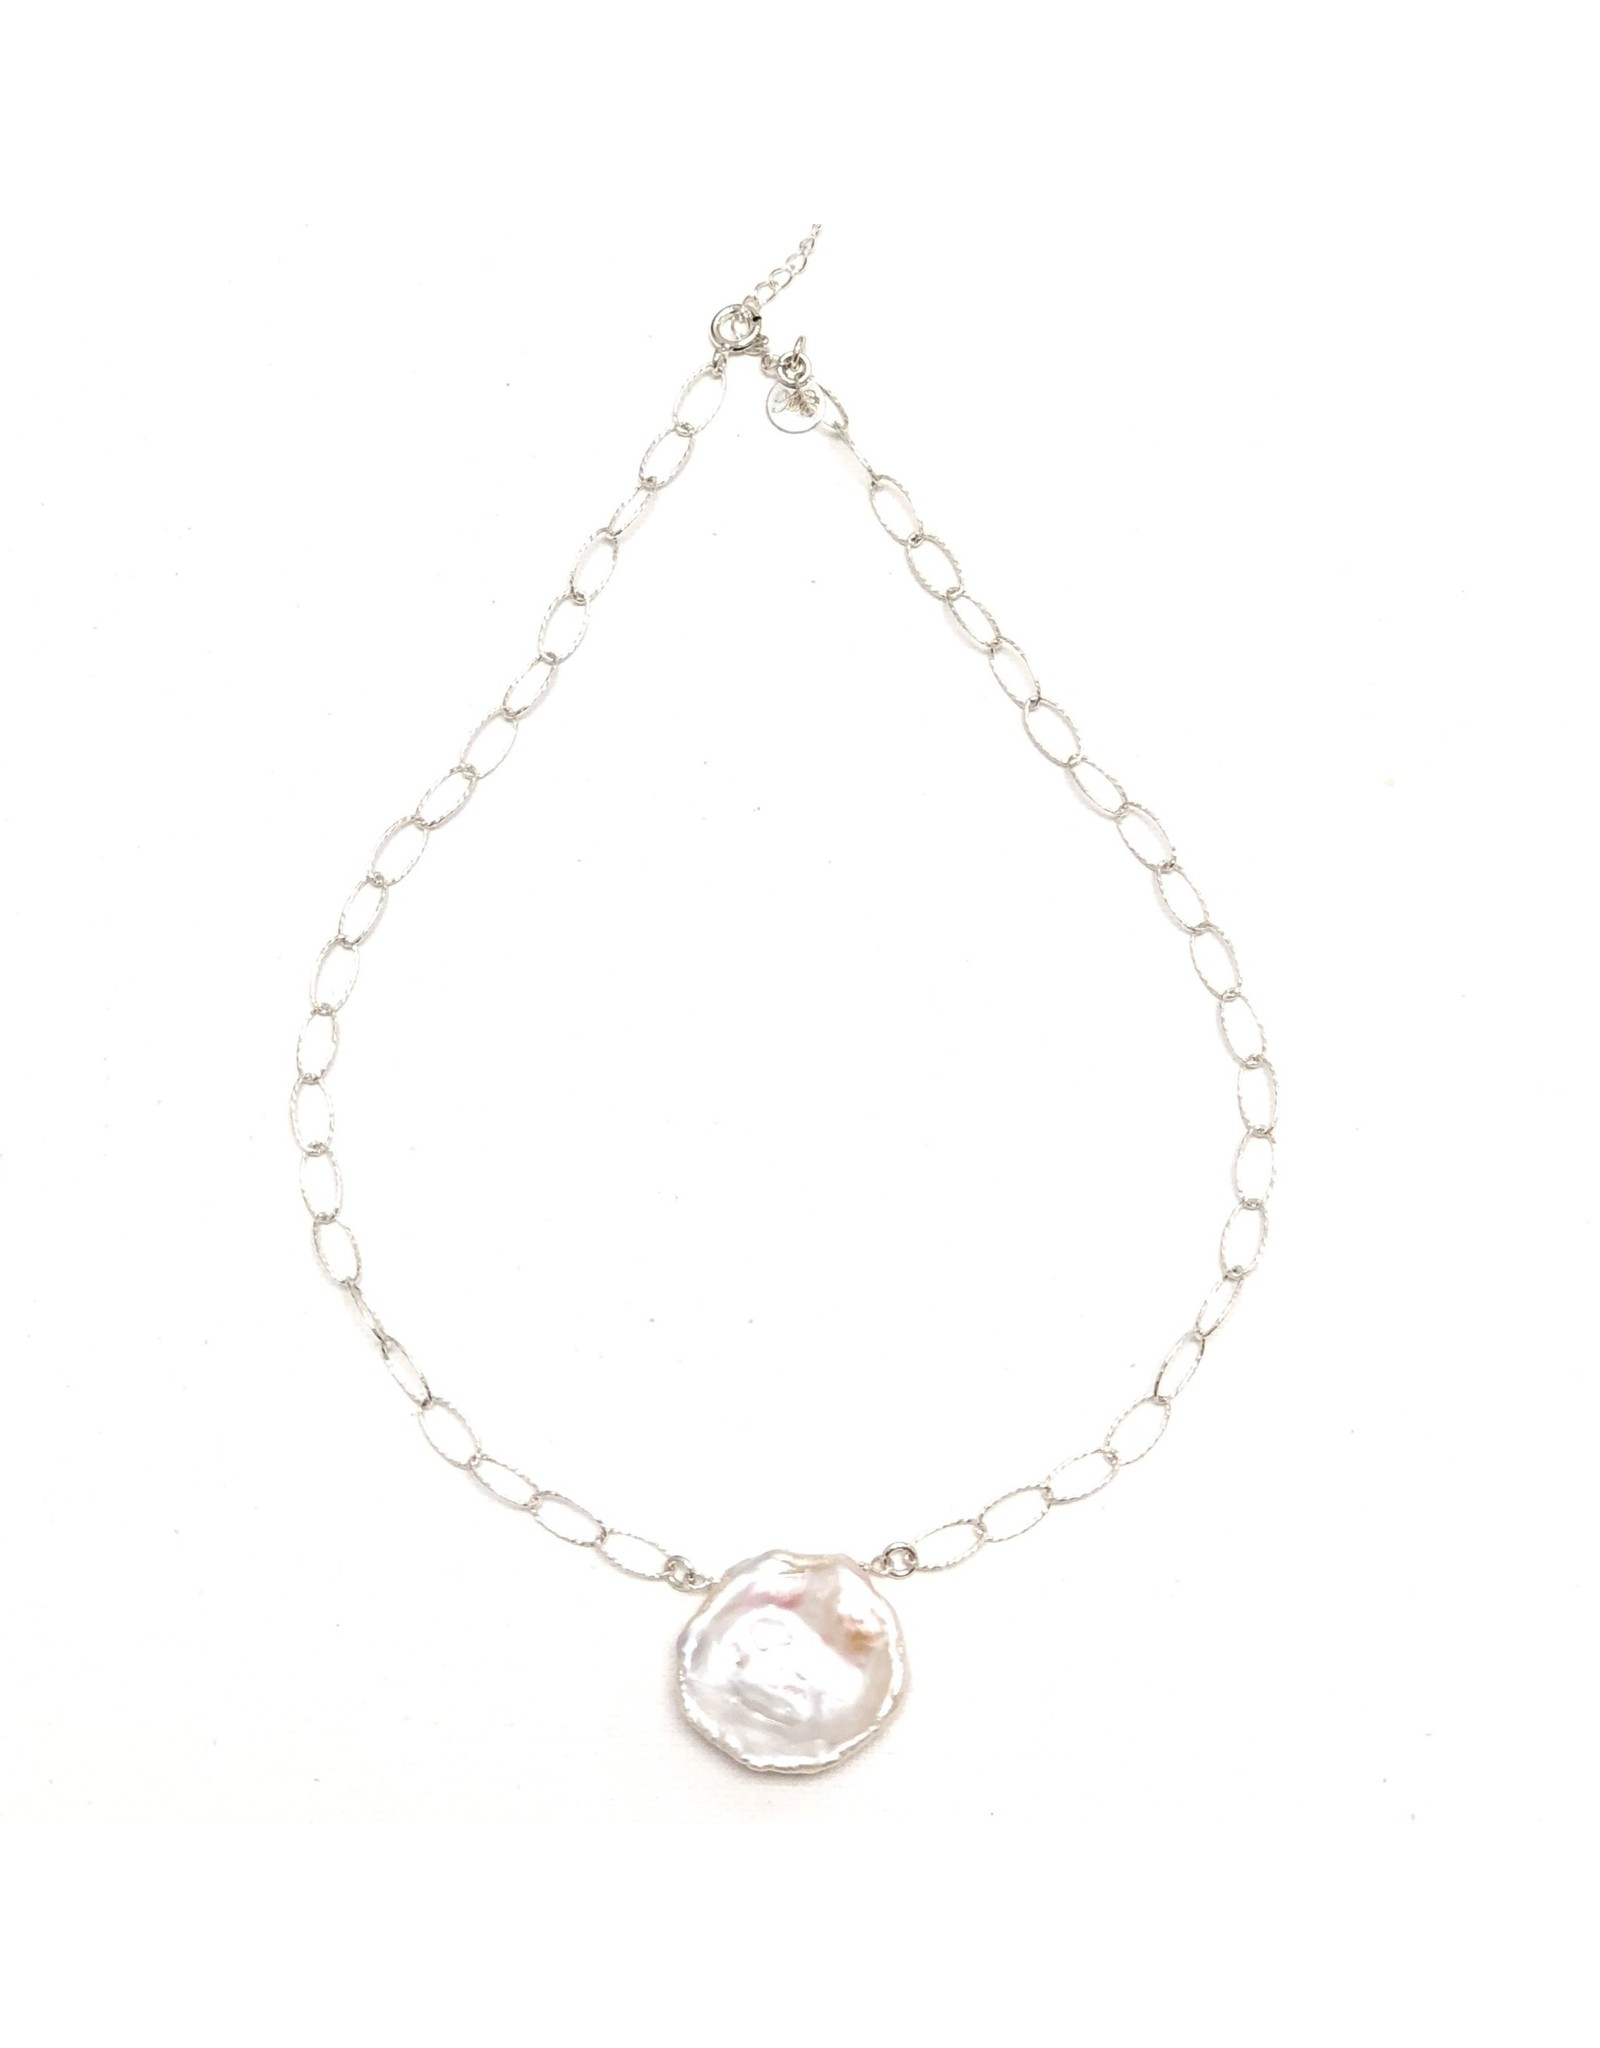 Round Keshi Pearl on Dia Cut Chain